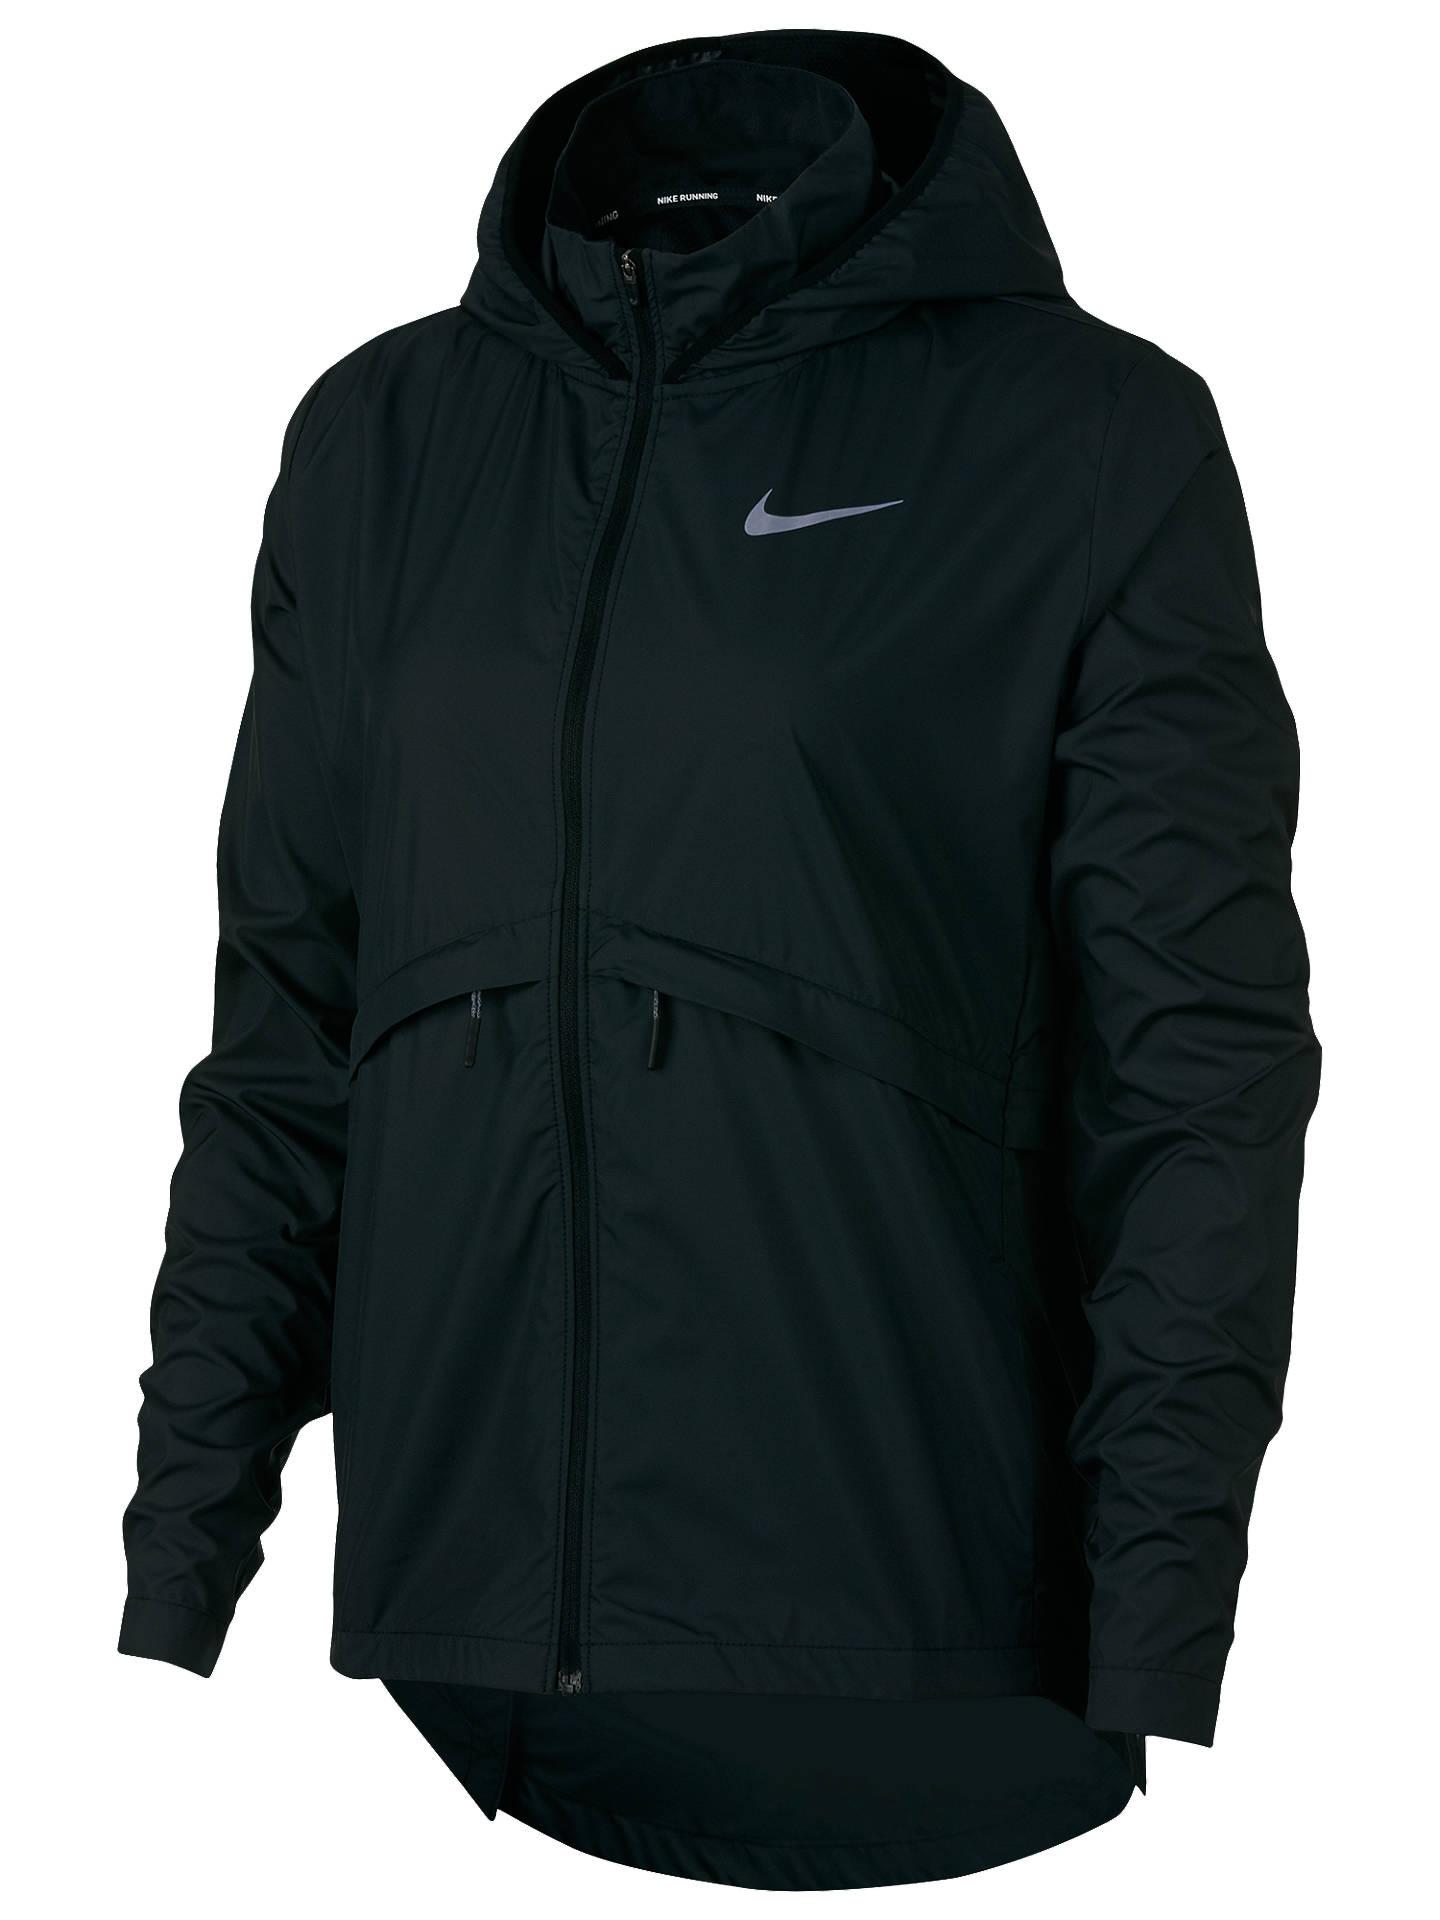 21a40b4762c6 Buy Nike Essential Hooded Women s Running Jacket